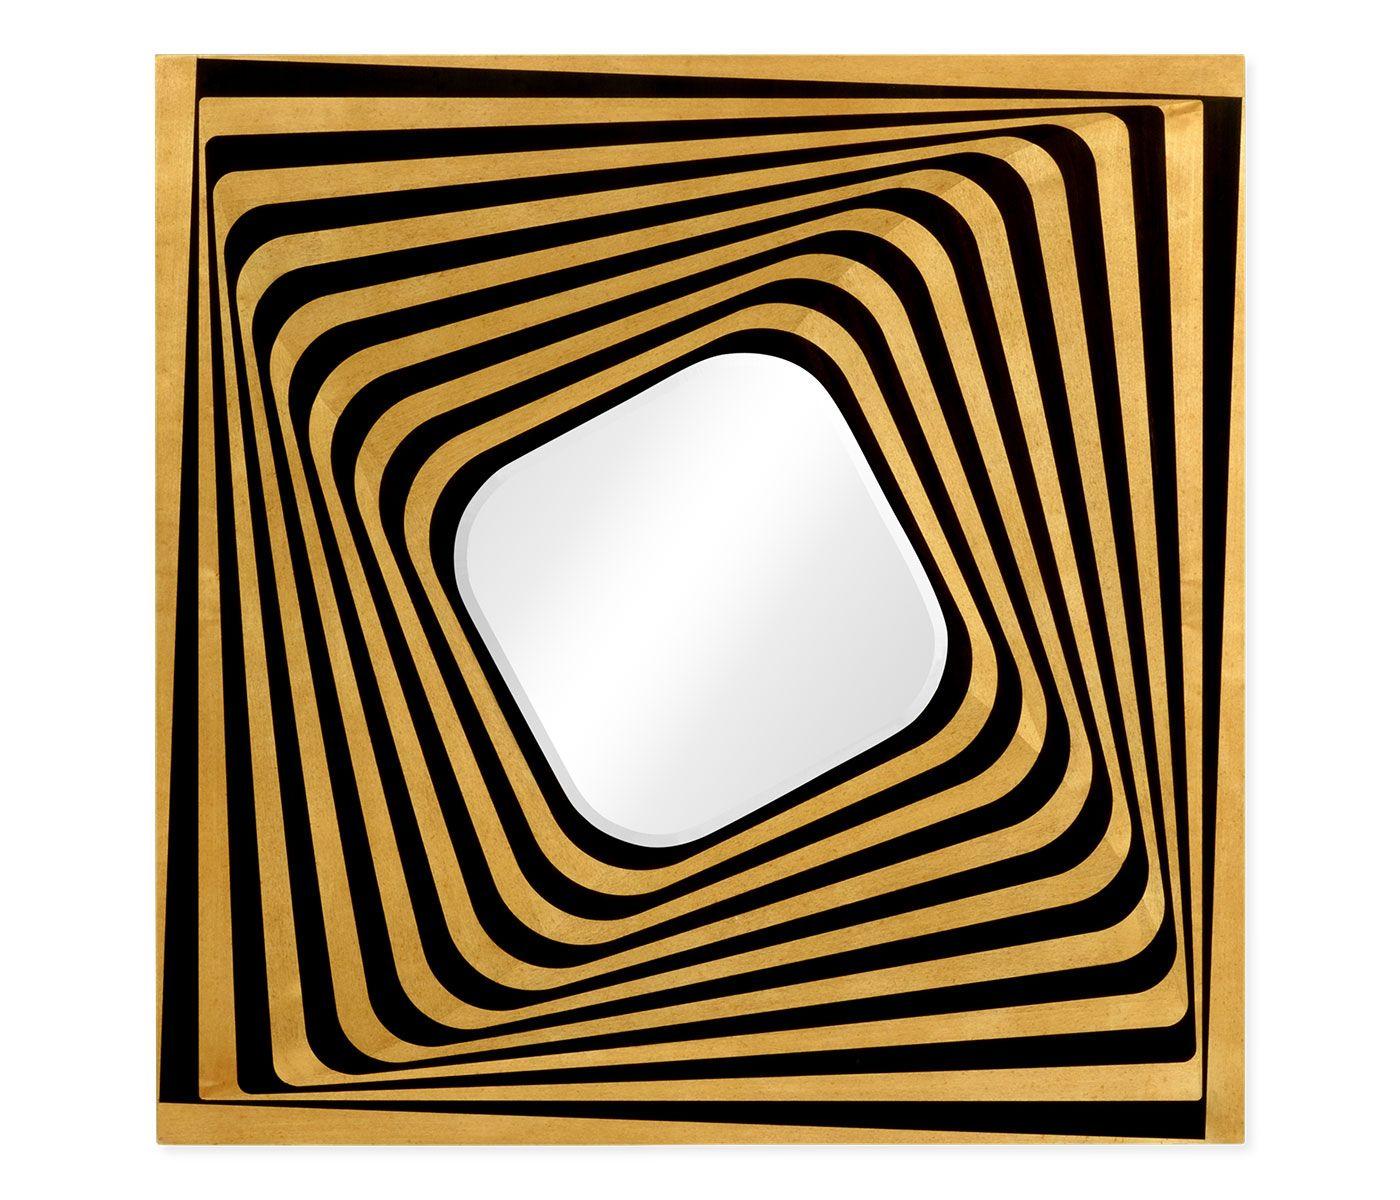 Psychedelic Op Art Mirror #JCmodern #jonathancharles  #jonathan_charles_russia #jonathancharlesrussia #jonathancharlesfurniture